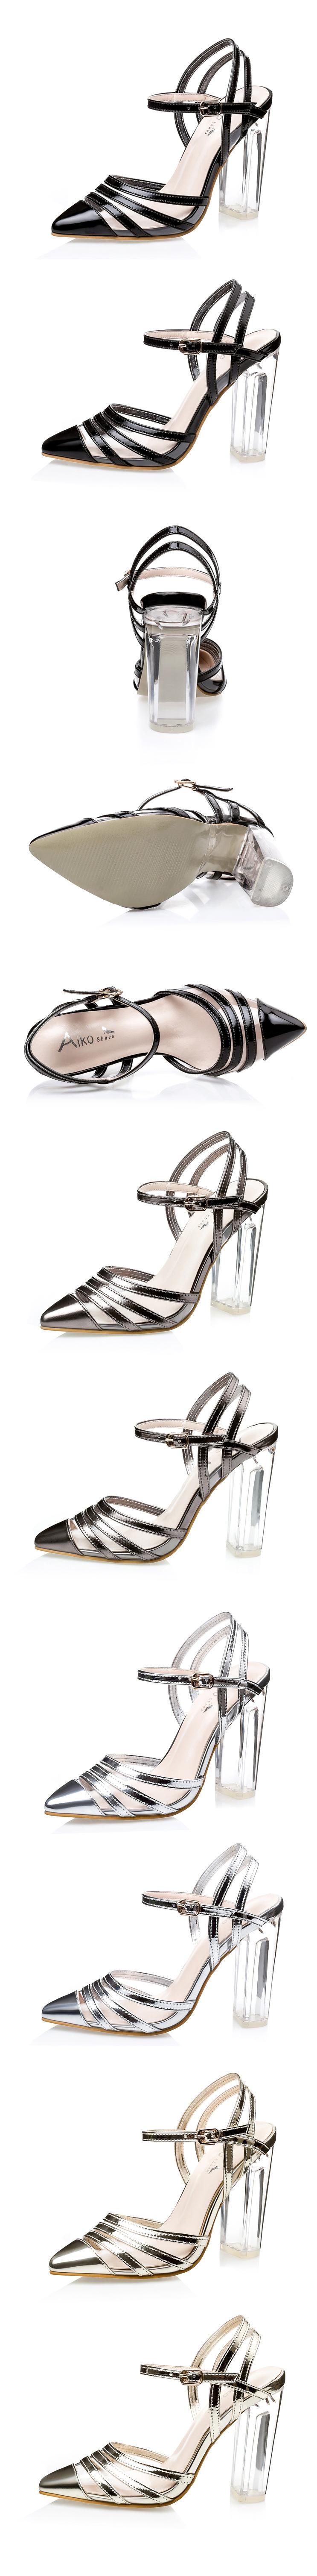 Fashion Women Shoes 2016 Spring Summer Sexy Crystal High Heels Women Pumps Platform Party Dress Pumps Women Sandals Silver